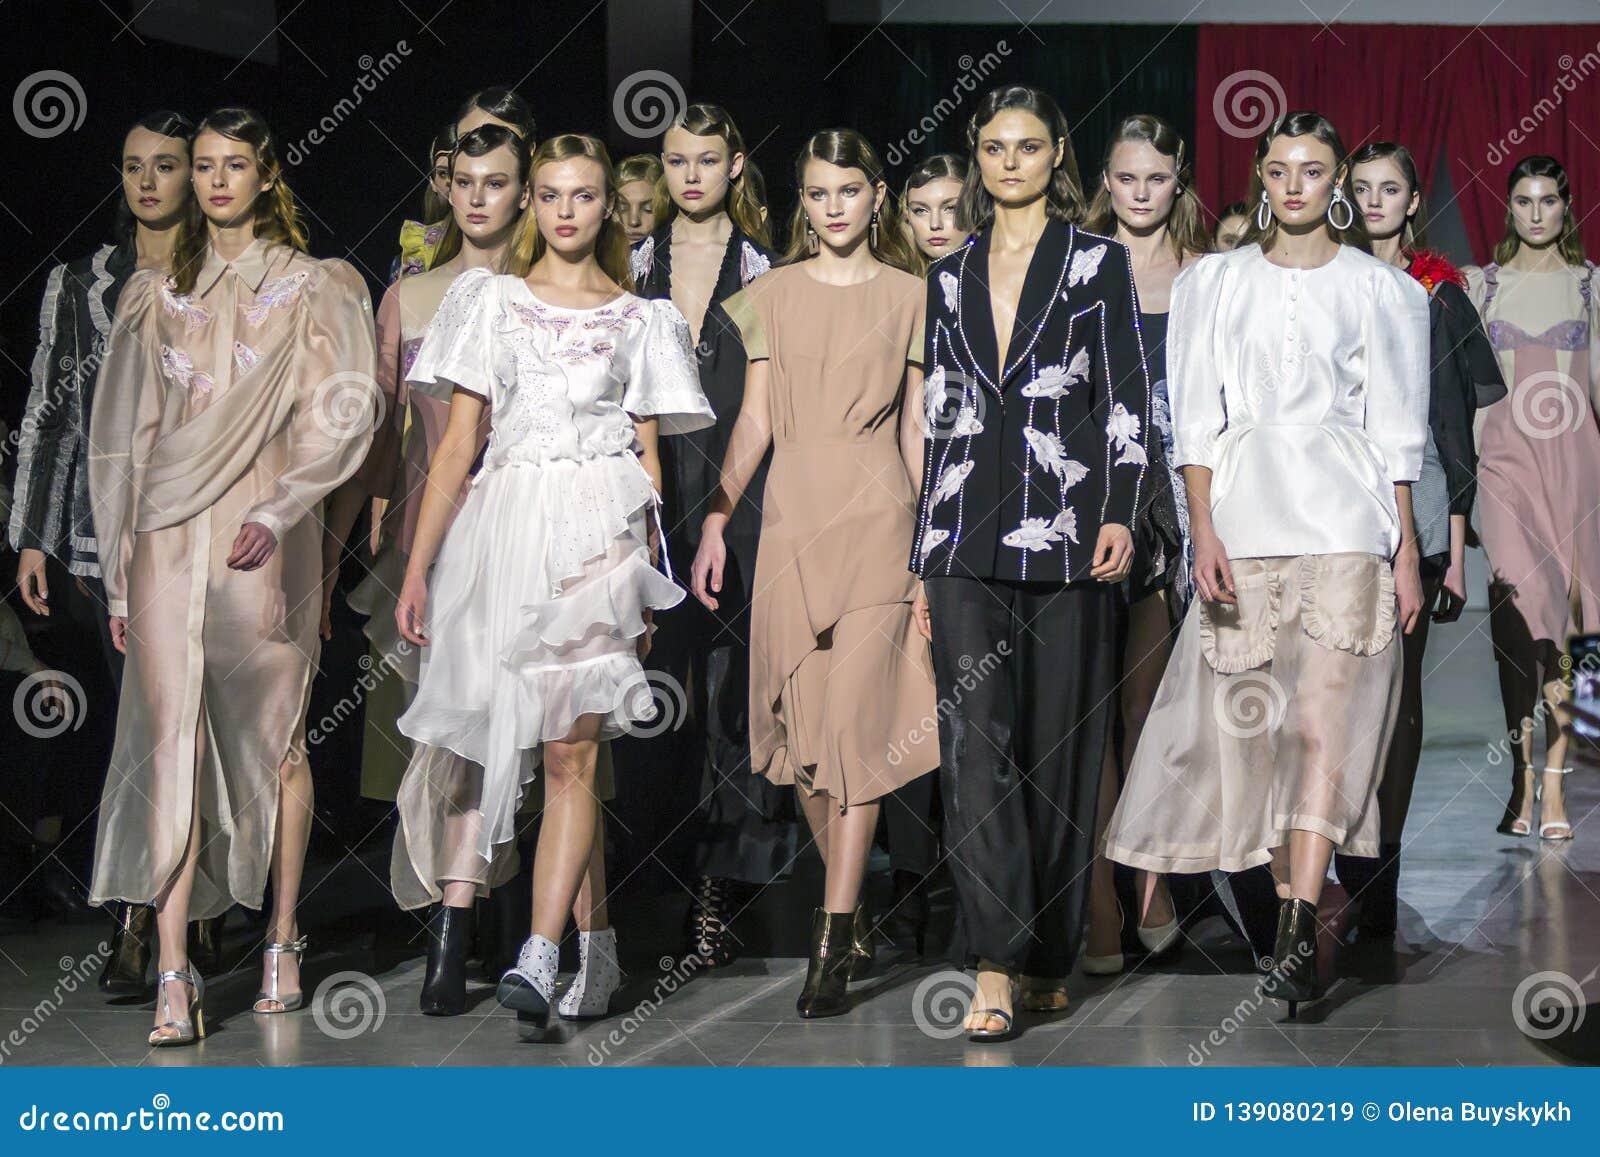 15c666a927c KYIV, UKRAINE - FEBRUARY 5, 2019: DARJA DONEZZ collection show during Ukrainian  Fashion Week 19-20 at Mystetsky Arsenal in Kyiv